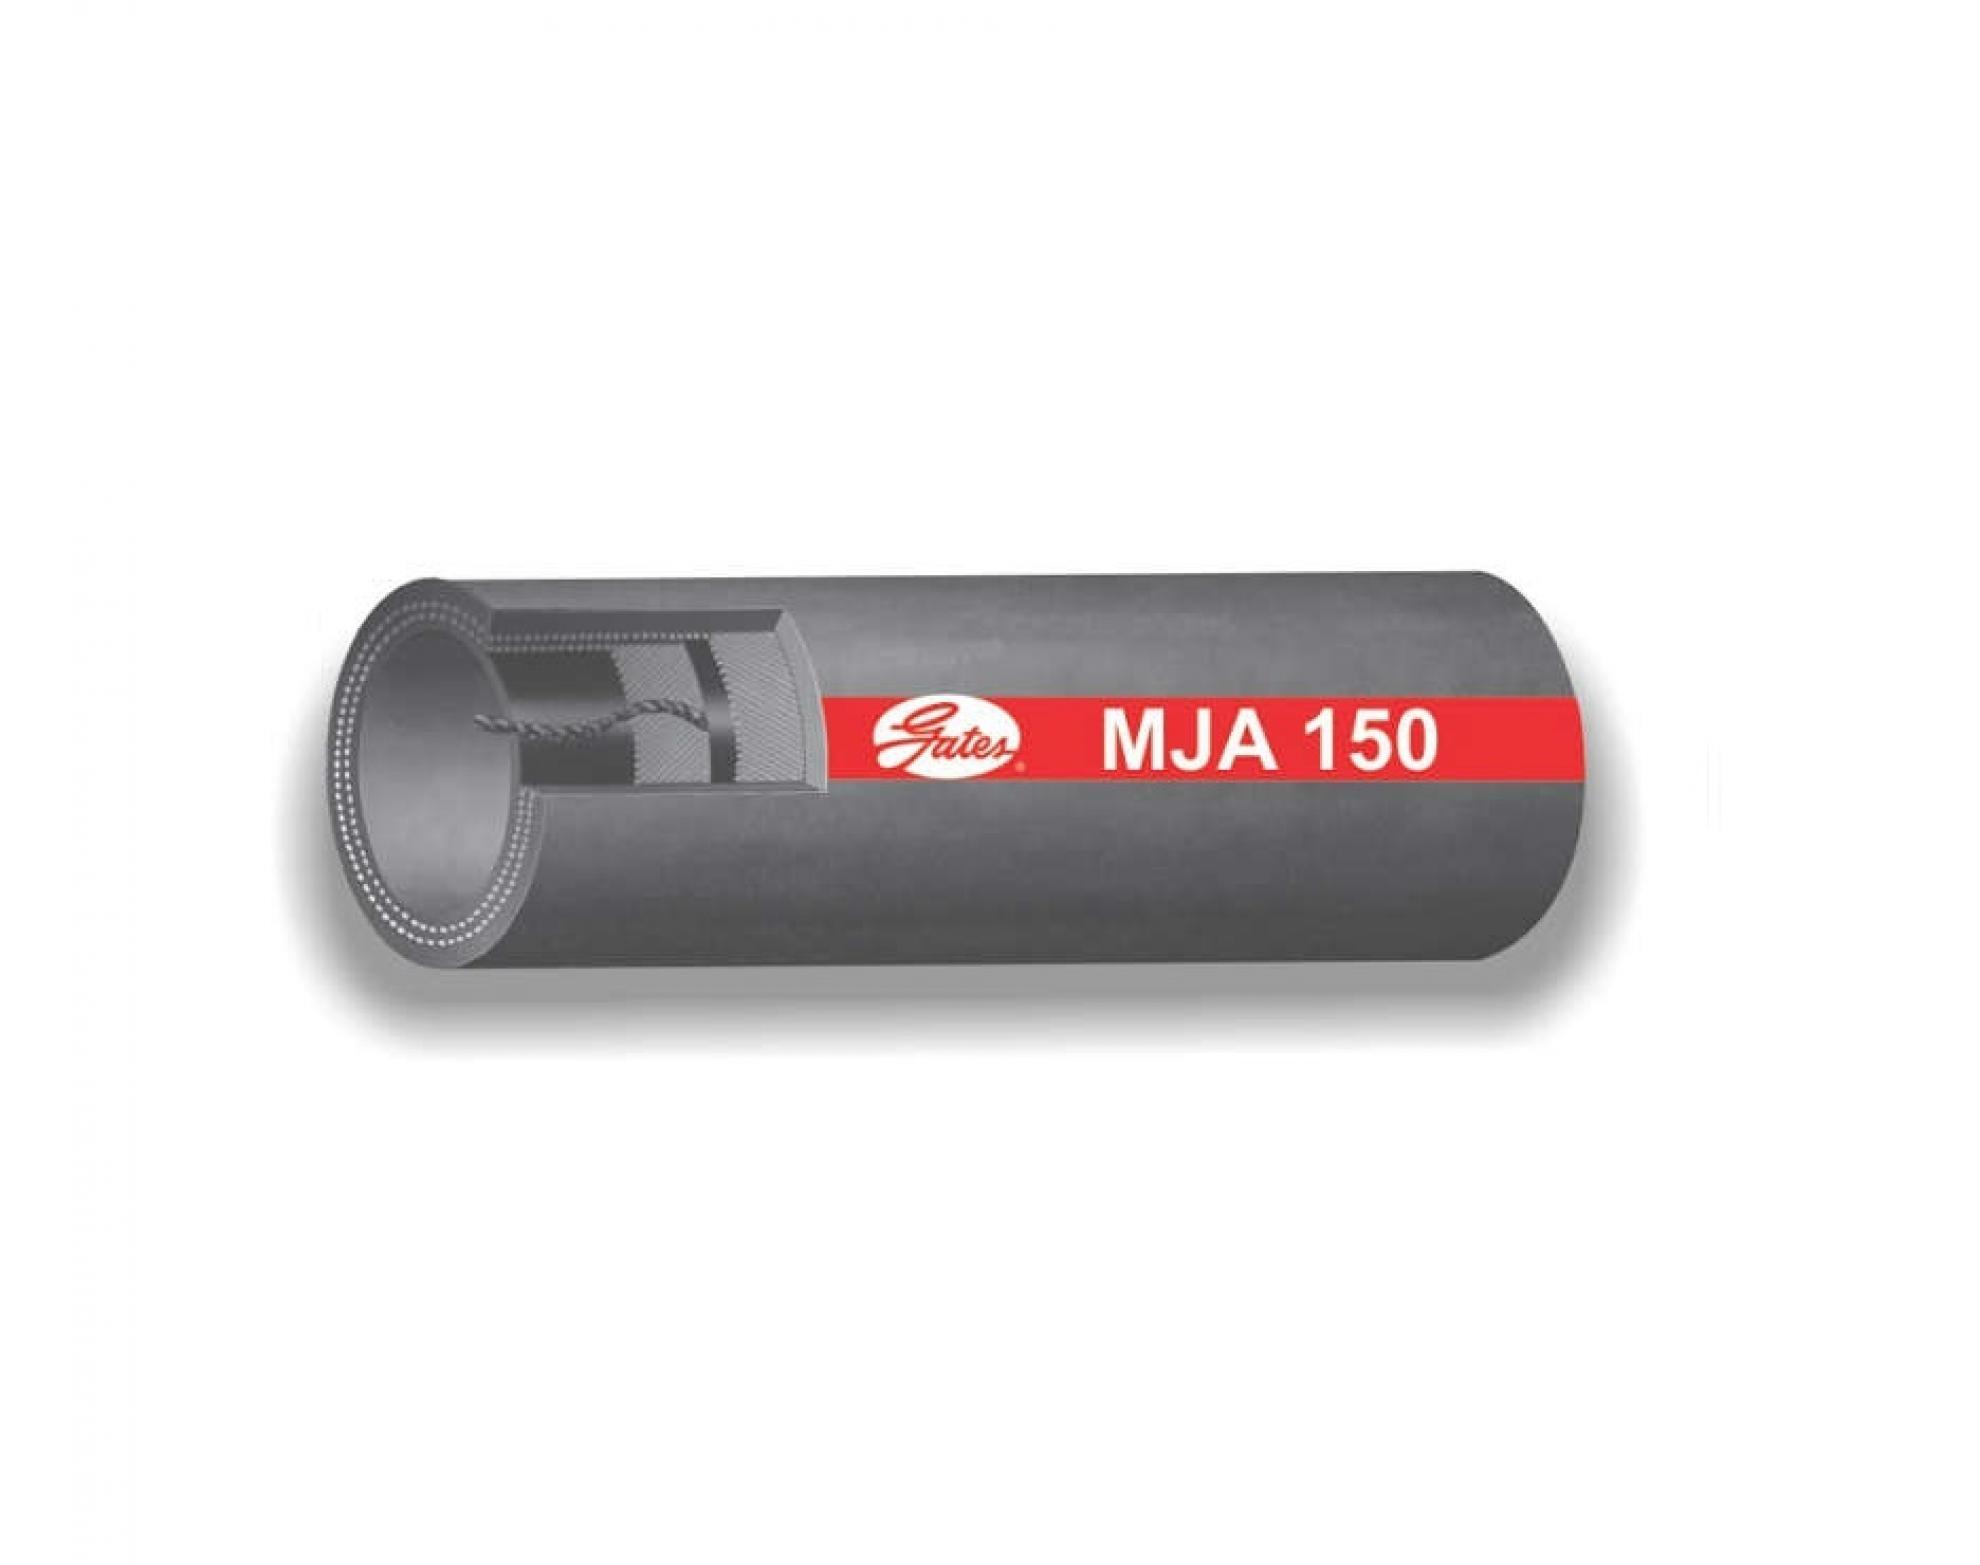 MANGUEIRAS INDUSTRIAIS MJA 150